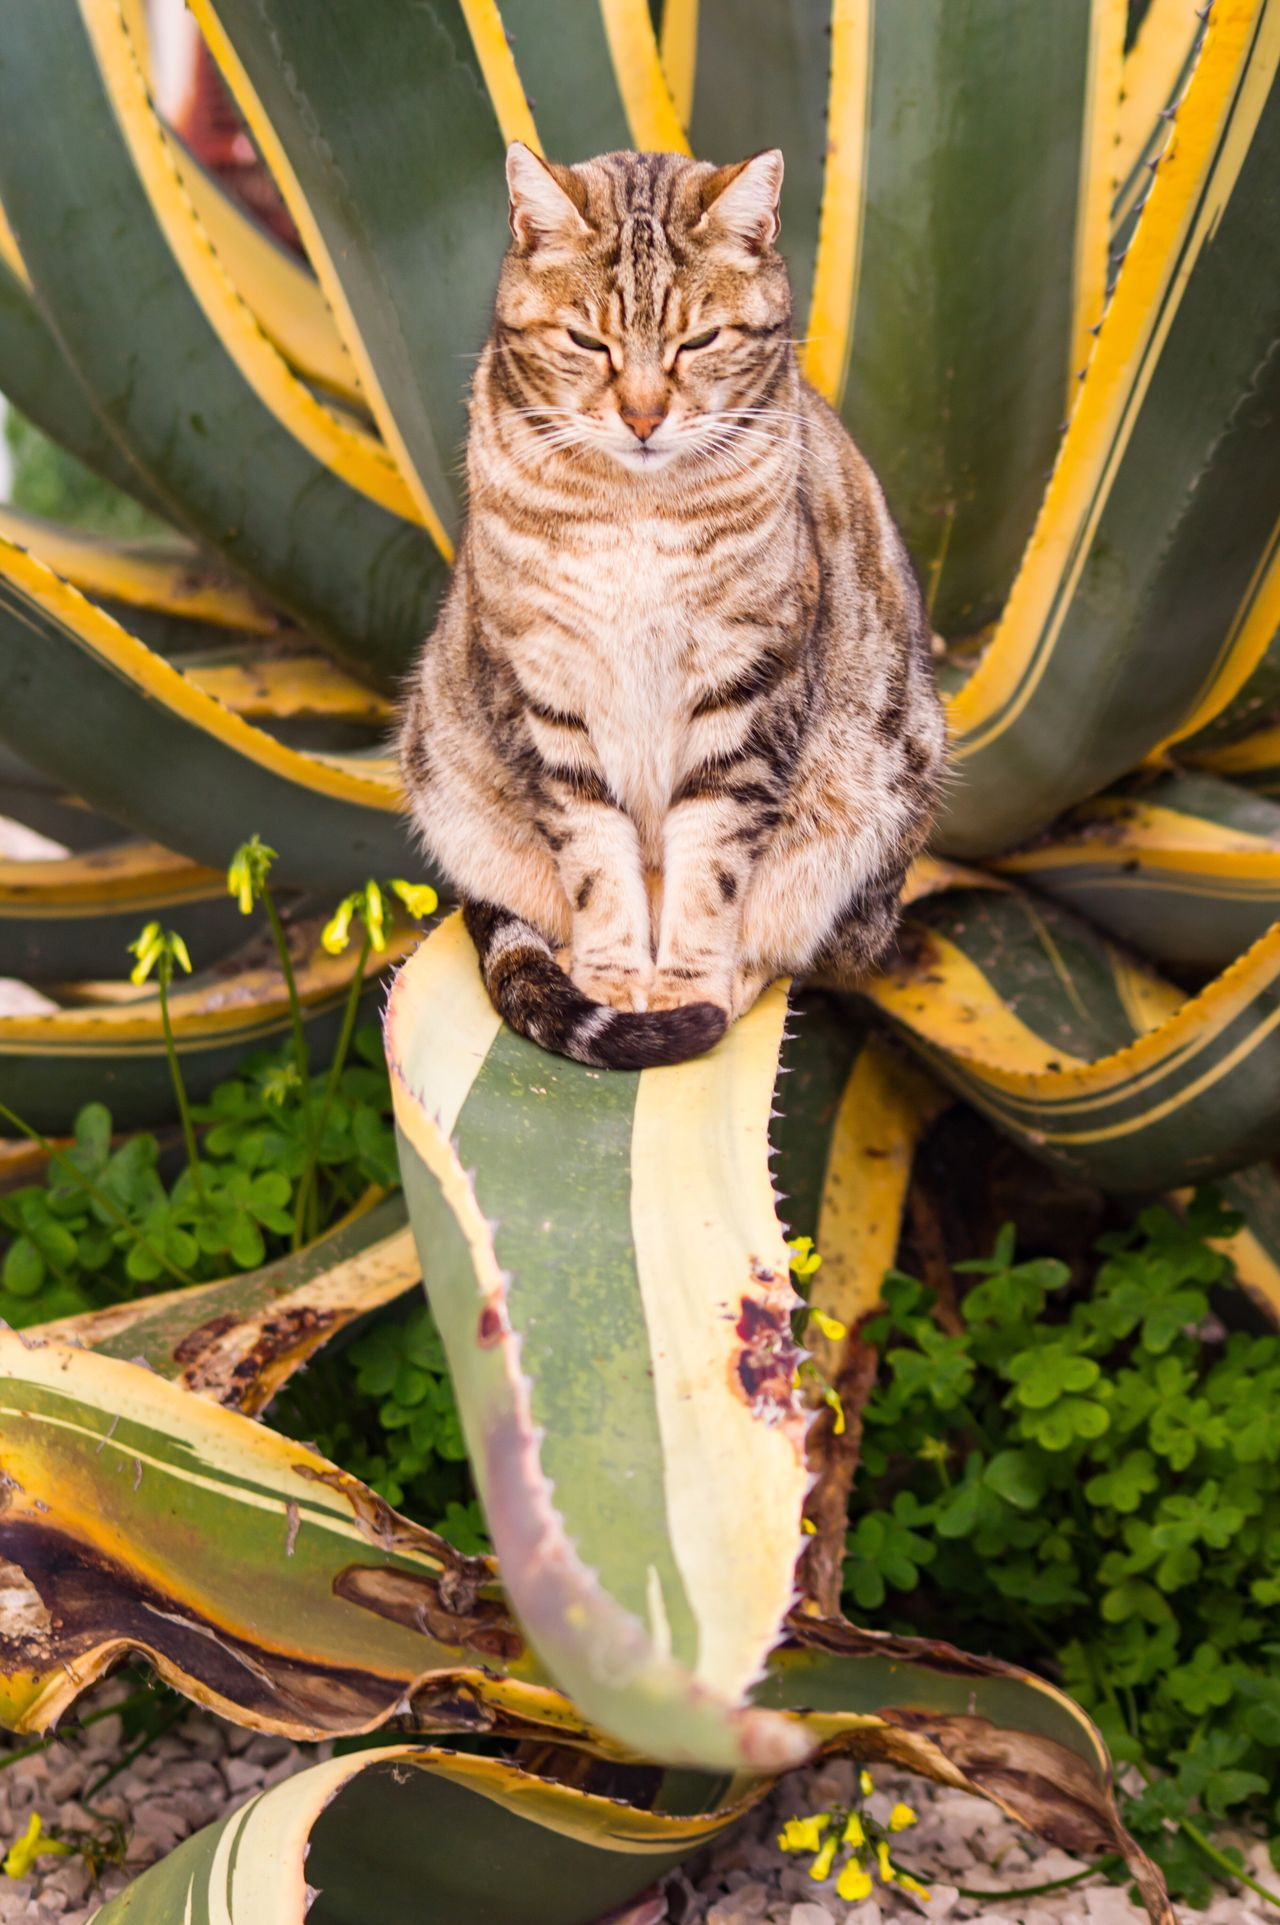 Photography Photo Photooftheday Cat Love Faro Algarve One Animal Domestic Cat Sitting Pets Leaf Plant Sleepy Portugal Albeferia Cute Cute Pets Love ♥ Lovely EyeEmBestPics EyeEm Photographer Photo Of The Day